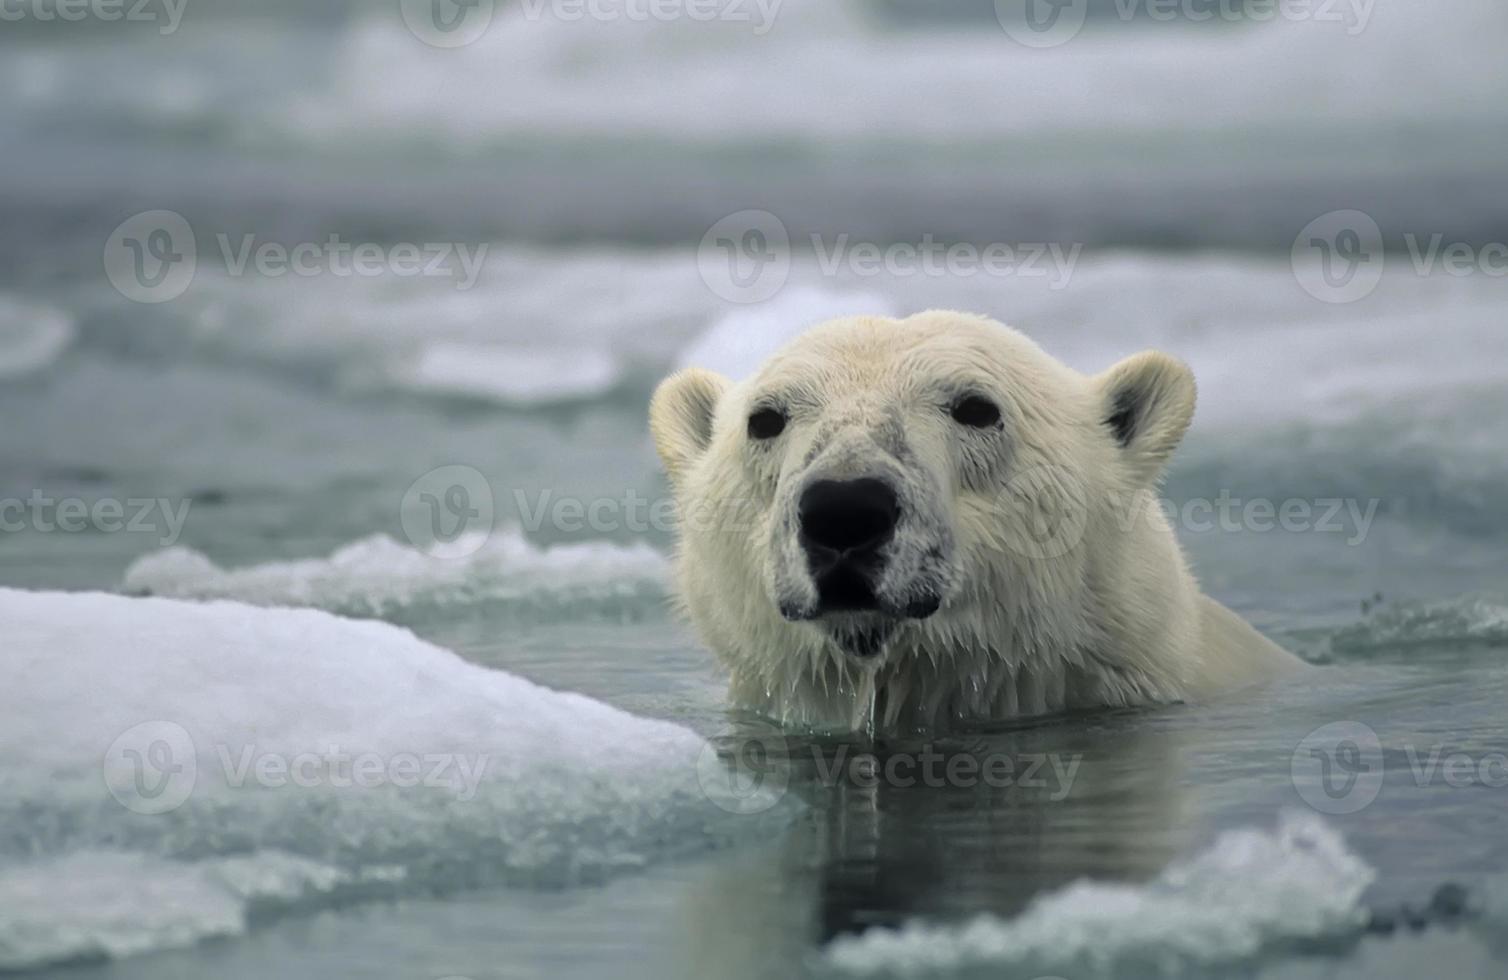 An adult polar bear swimming between icebergs photo